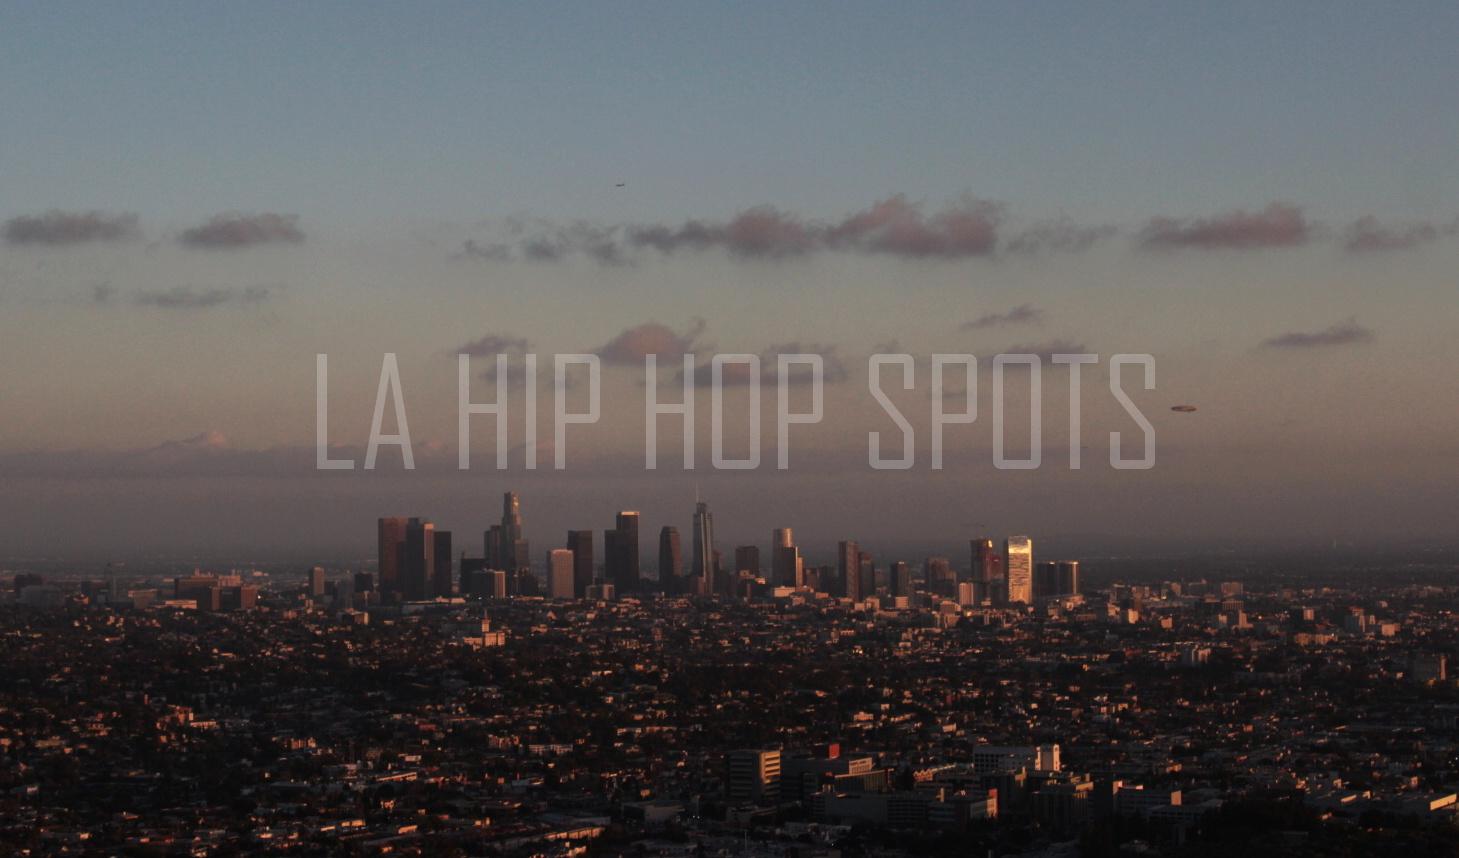 Los Angeles hip hop spots